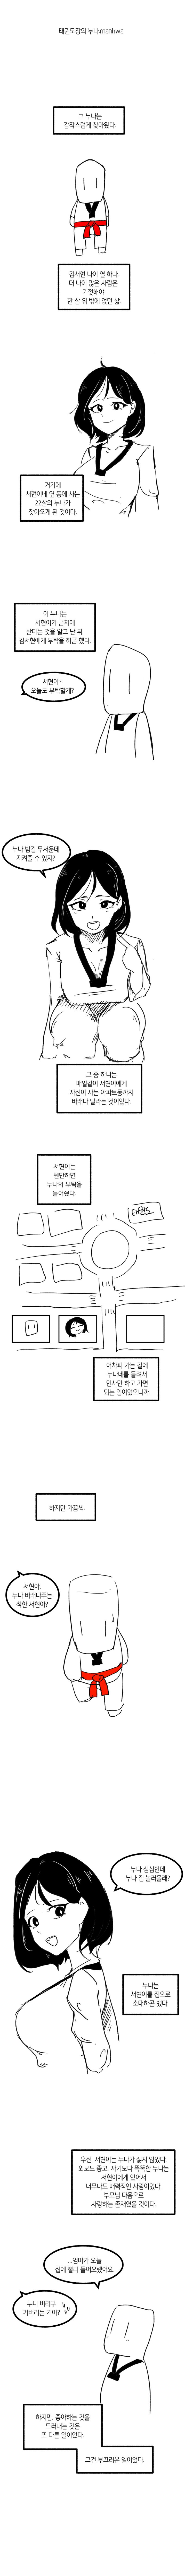 viewimage.php?id=3eb4de21e9d73ab360b8dab04785736f&no=24b0d769e1d32ca73dec8ffa11d02831046ced35d9c2bd23e7054f3c2d8467a842be7c750024e801d4ef62428f52f4fdab7b162d6020e608597600910d573a9f2354820ee1b92d90e6811f2f